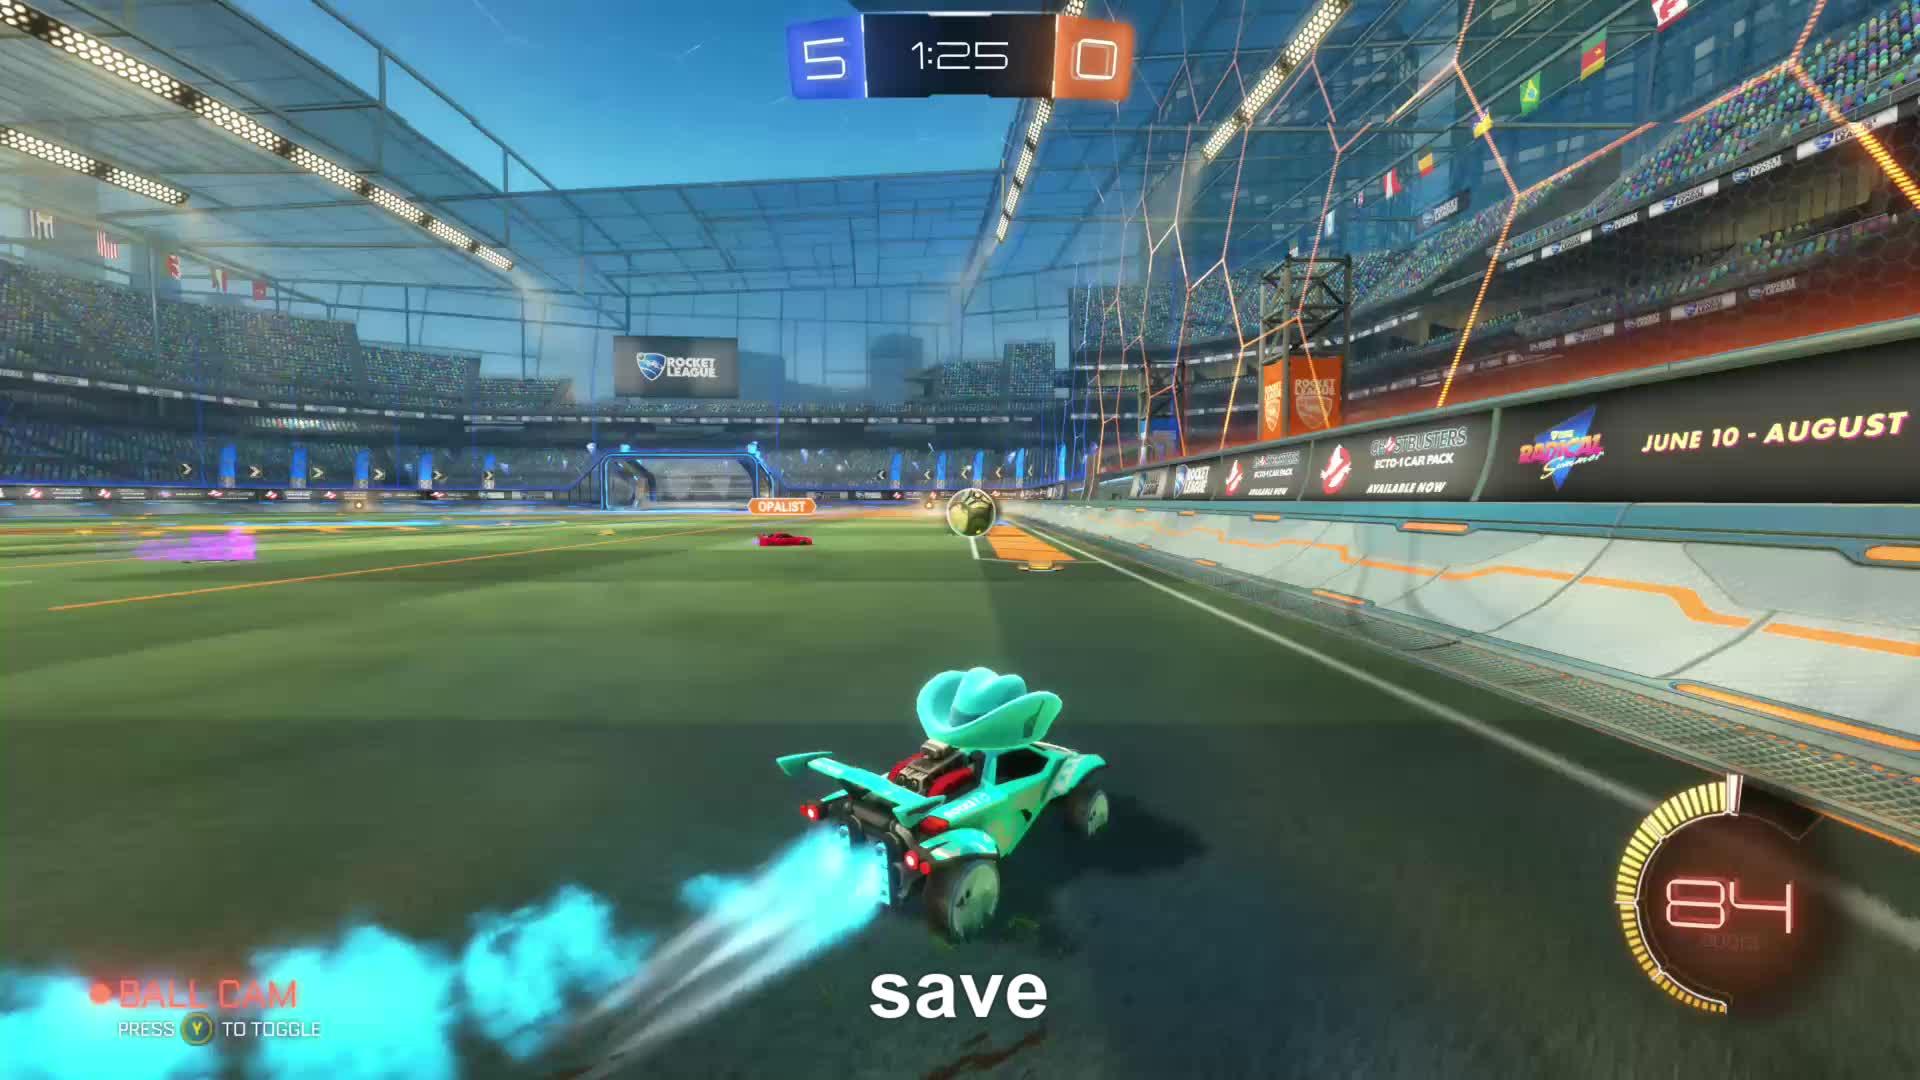 RocketLeague, The Grand Plat, gamer dvr, xbox, xbox one, ceiling save GIFs